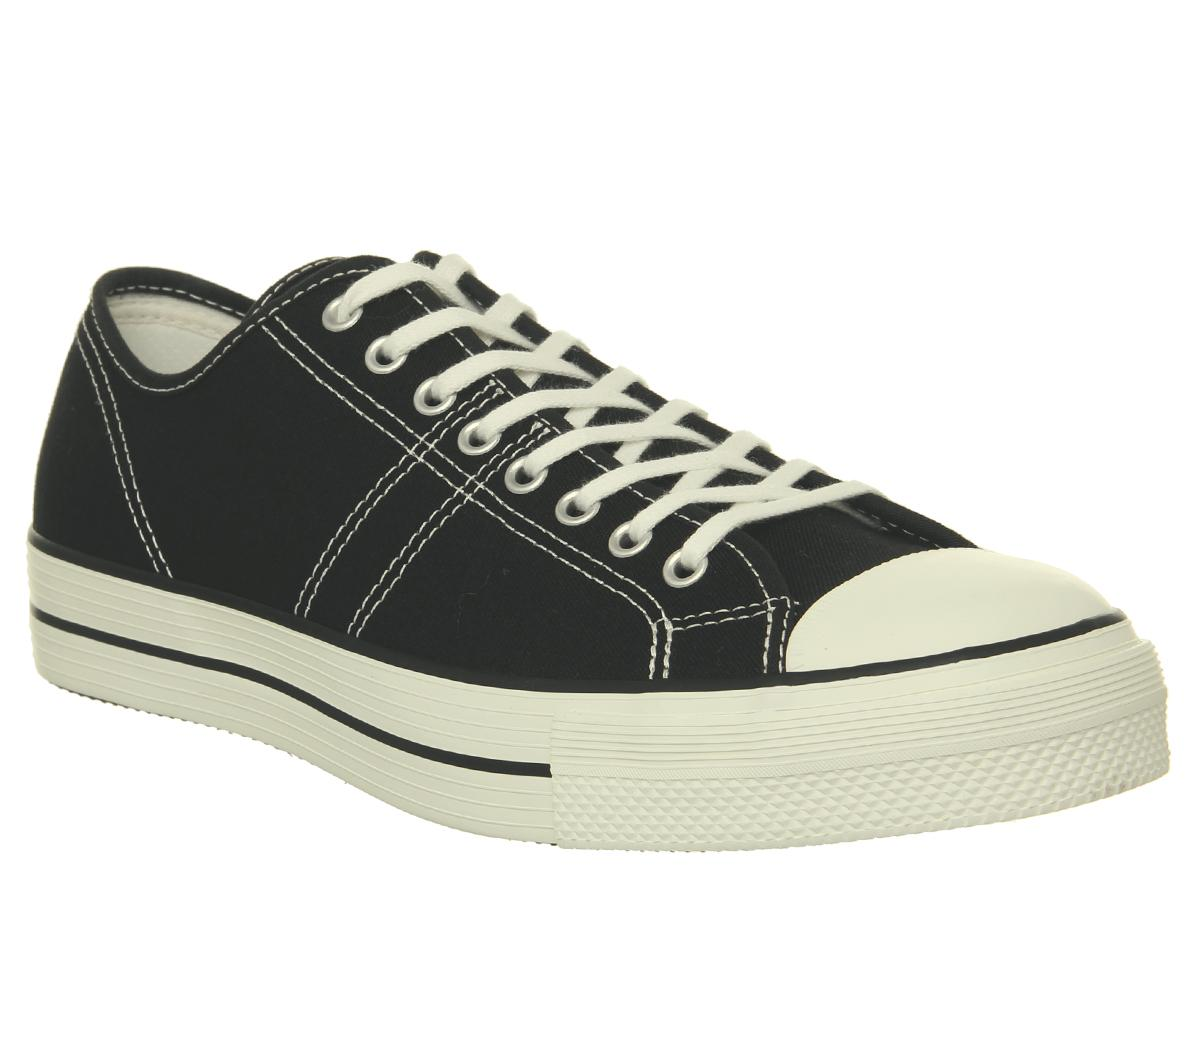 Converse Lucky Star Ox Black White